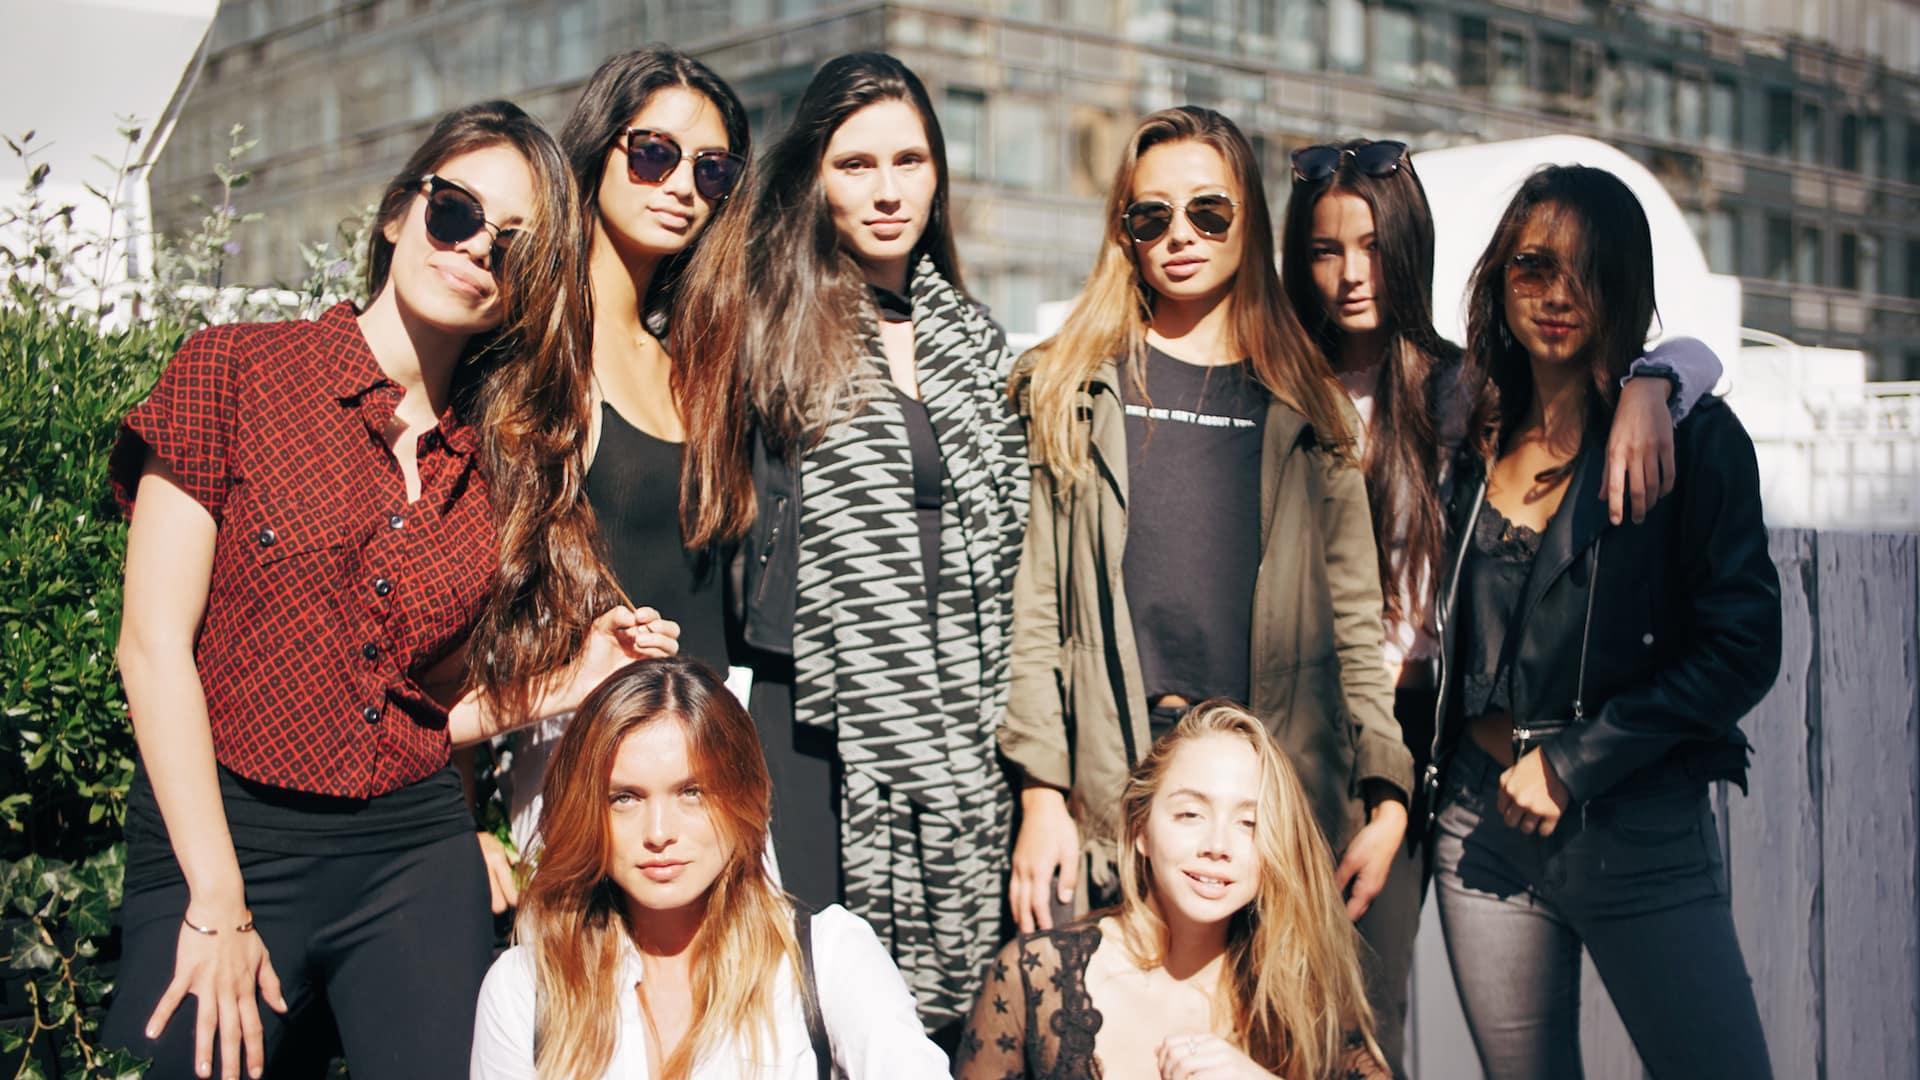 New York Fashion Week female models